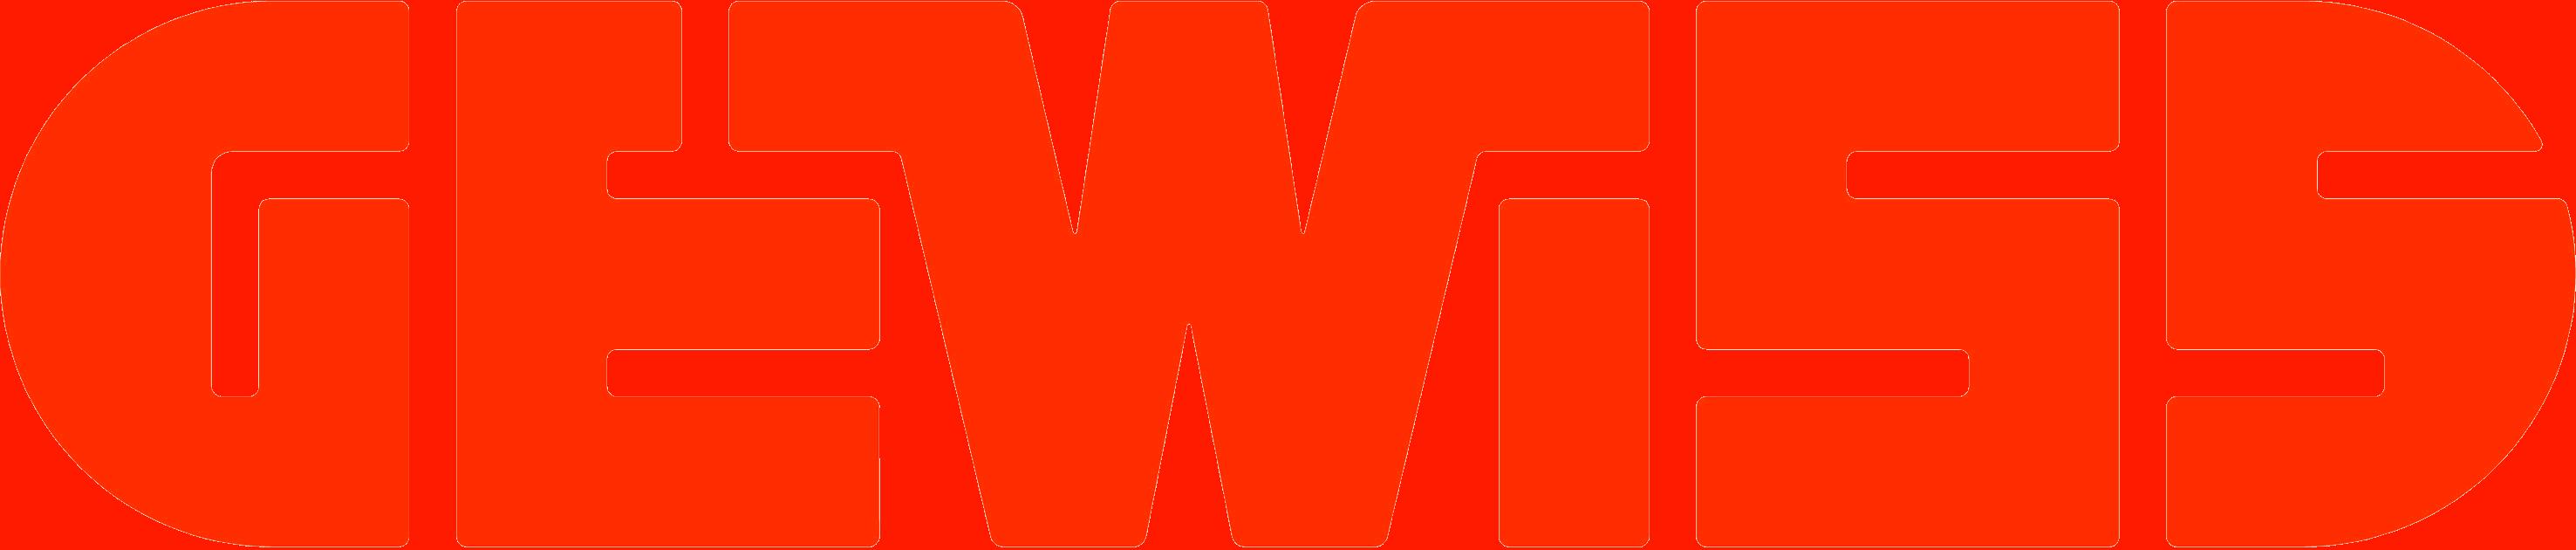 file logo wikipedia